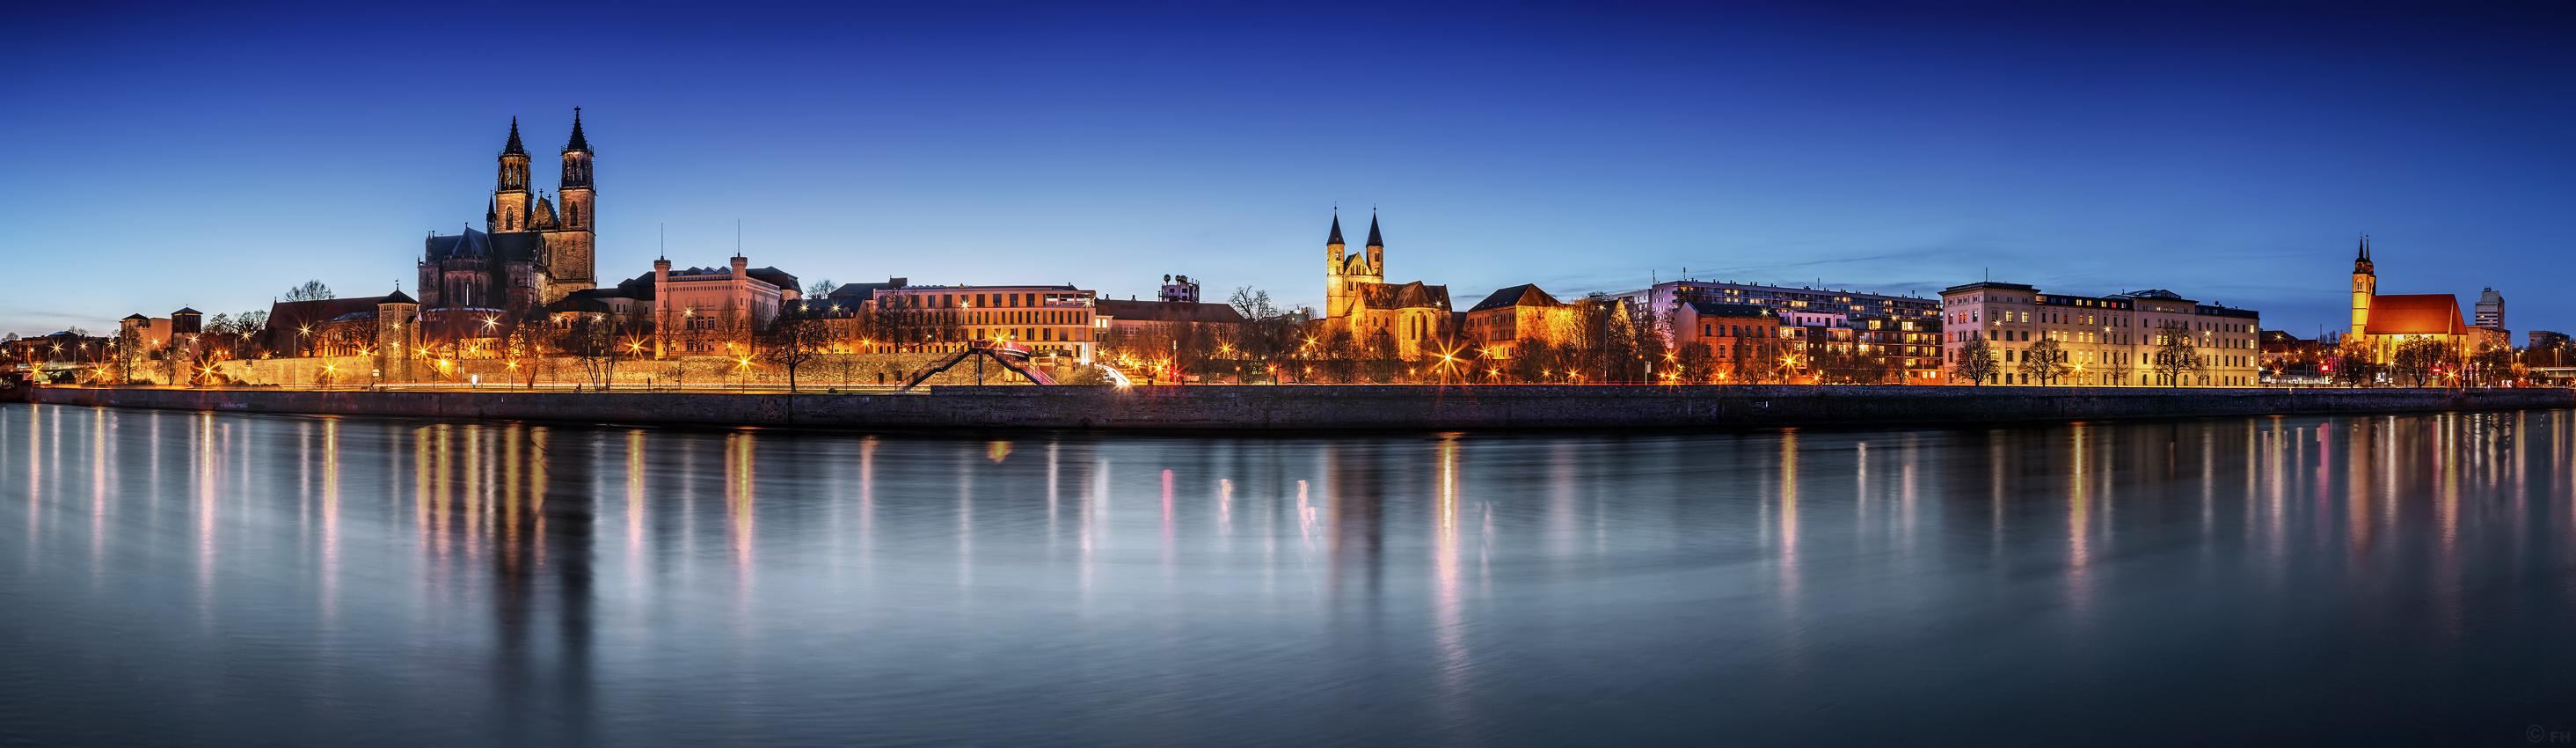 Magdeburg_Panorama_V4_k